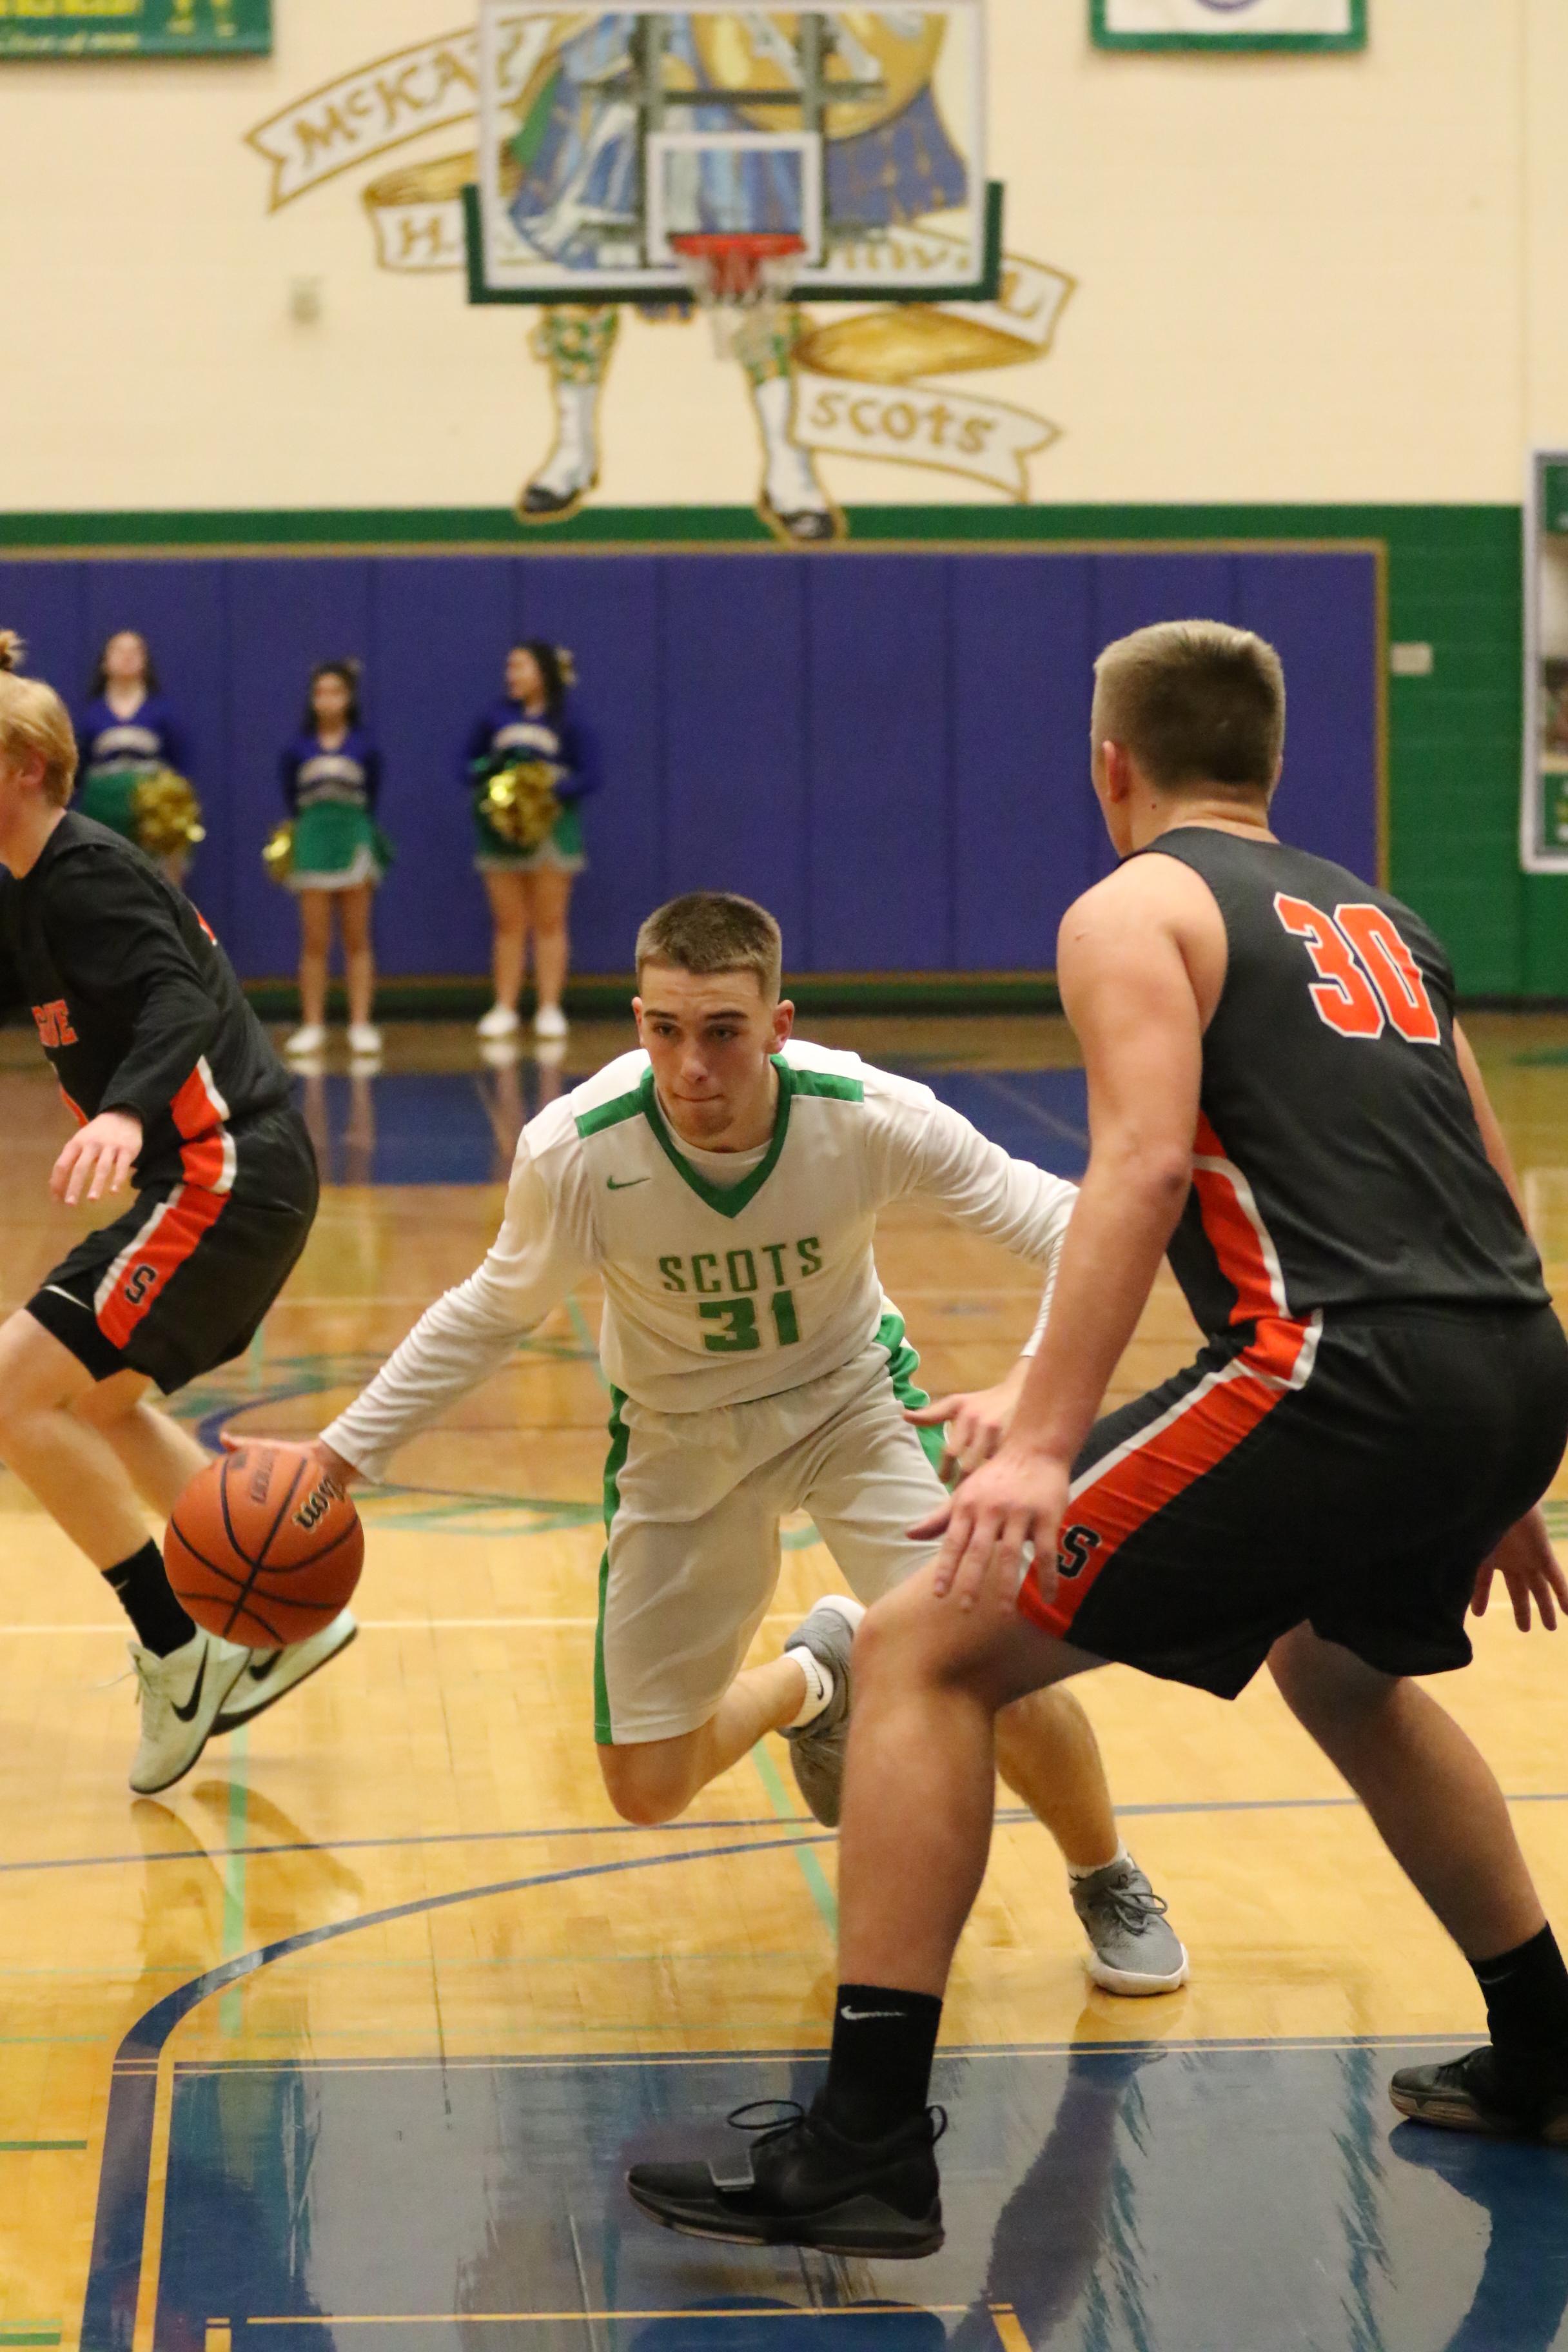 Ryan Bangs taking it to the basket. Photo by Kent Brewer.